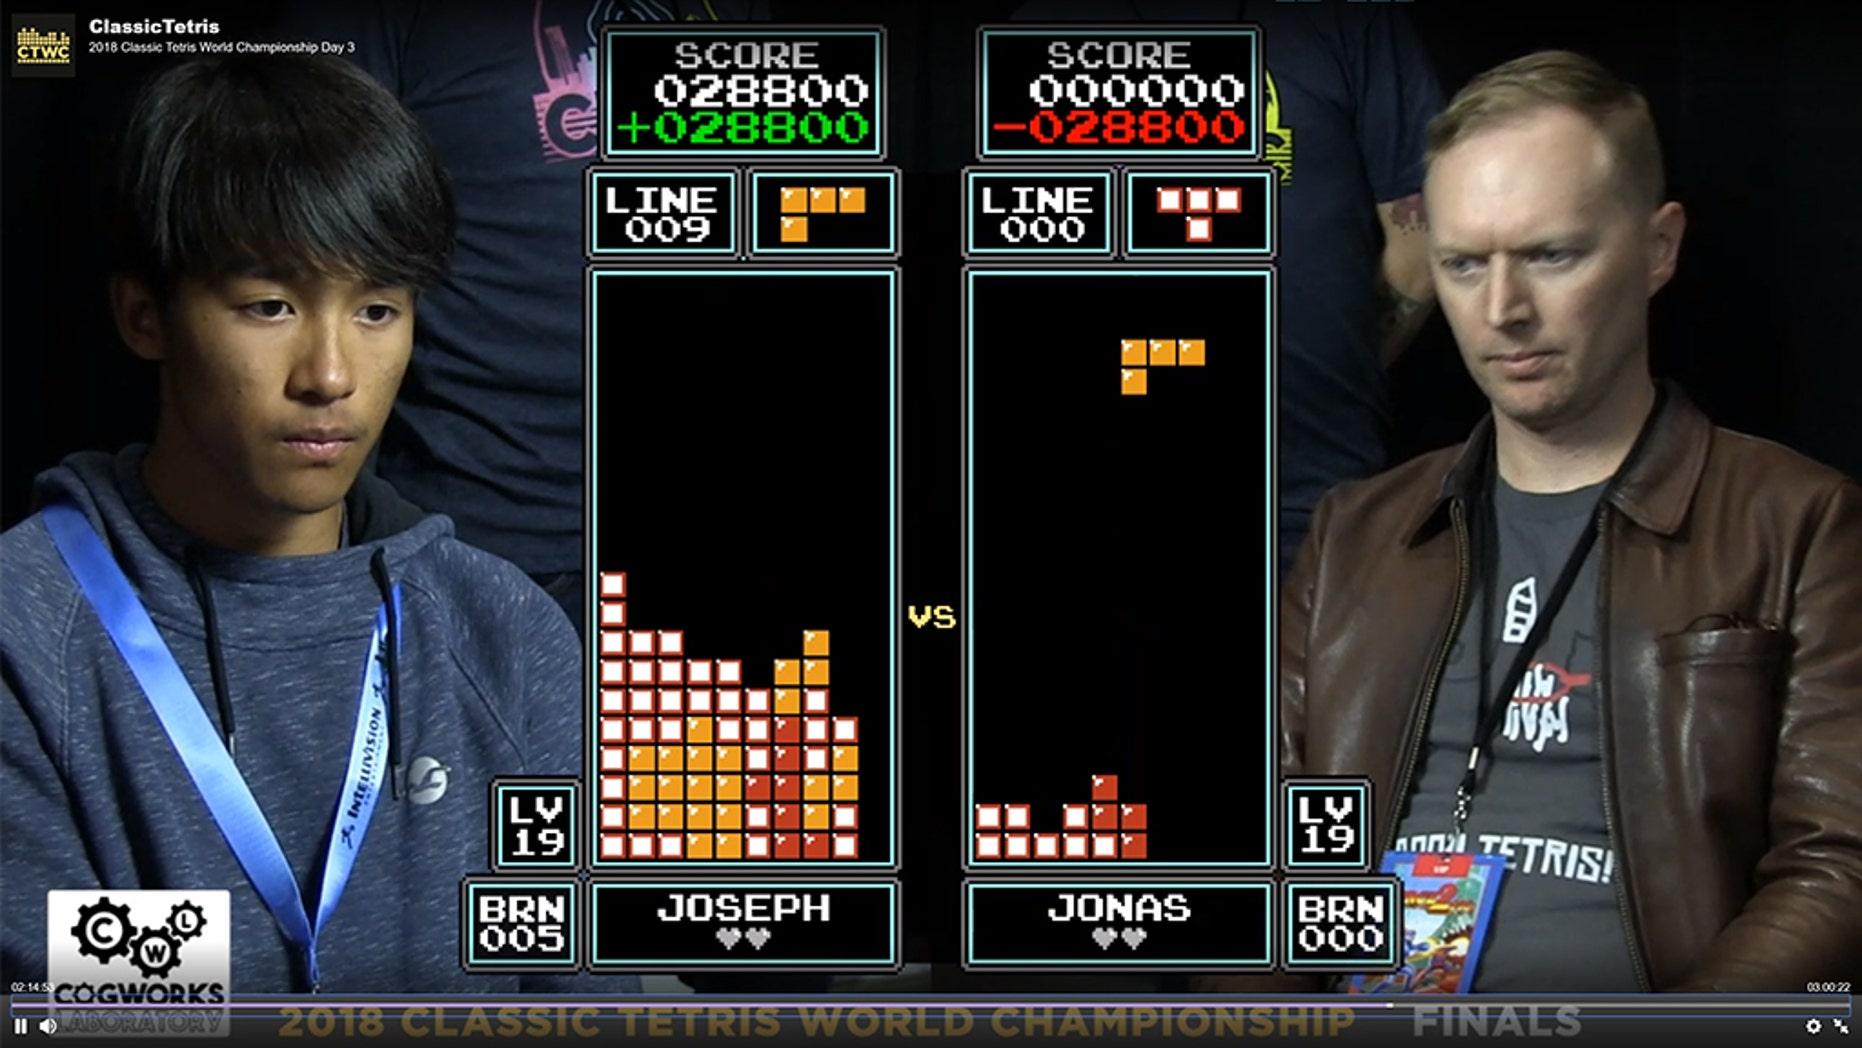 "Joseph Saelee (left) def. Jonas Neubauer (right) to win the Classic Tetris World Championship 201<div class=""e3lan e3lan-in-post1""><script async src=""//pagead2.googlesyndication.com/pagead/js/adsbygoogle.js""></script> <!-- Text_Display_Responsive --> <ins class=""adsbygoogle""      style=""display:block""      data-ad-client=""ca-pub-6192903739091894""      data-ad-slot=""3136787391""      data-ad-format=""auto""      data-full-width-responsive=""true""></ins> <script> (adsbygoogle = window.adsbygoogle || []).push({}); </script></div>8."